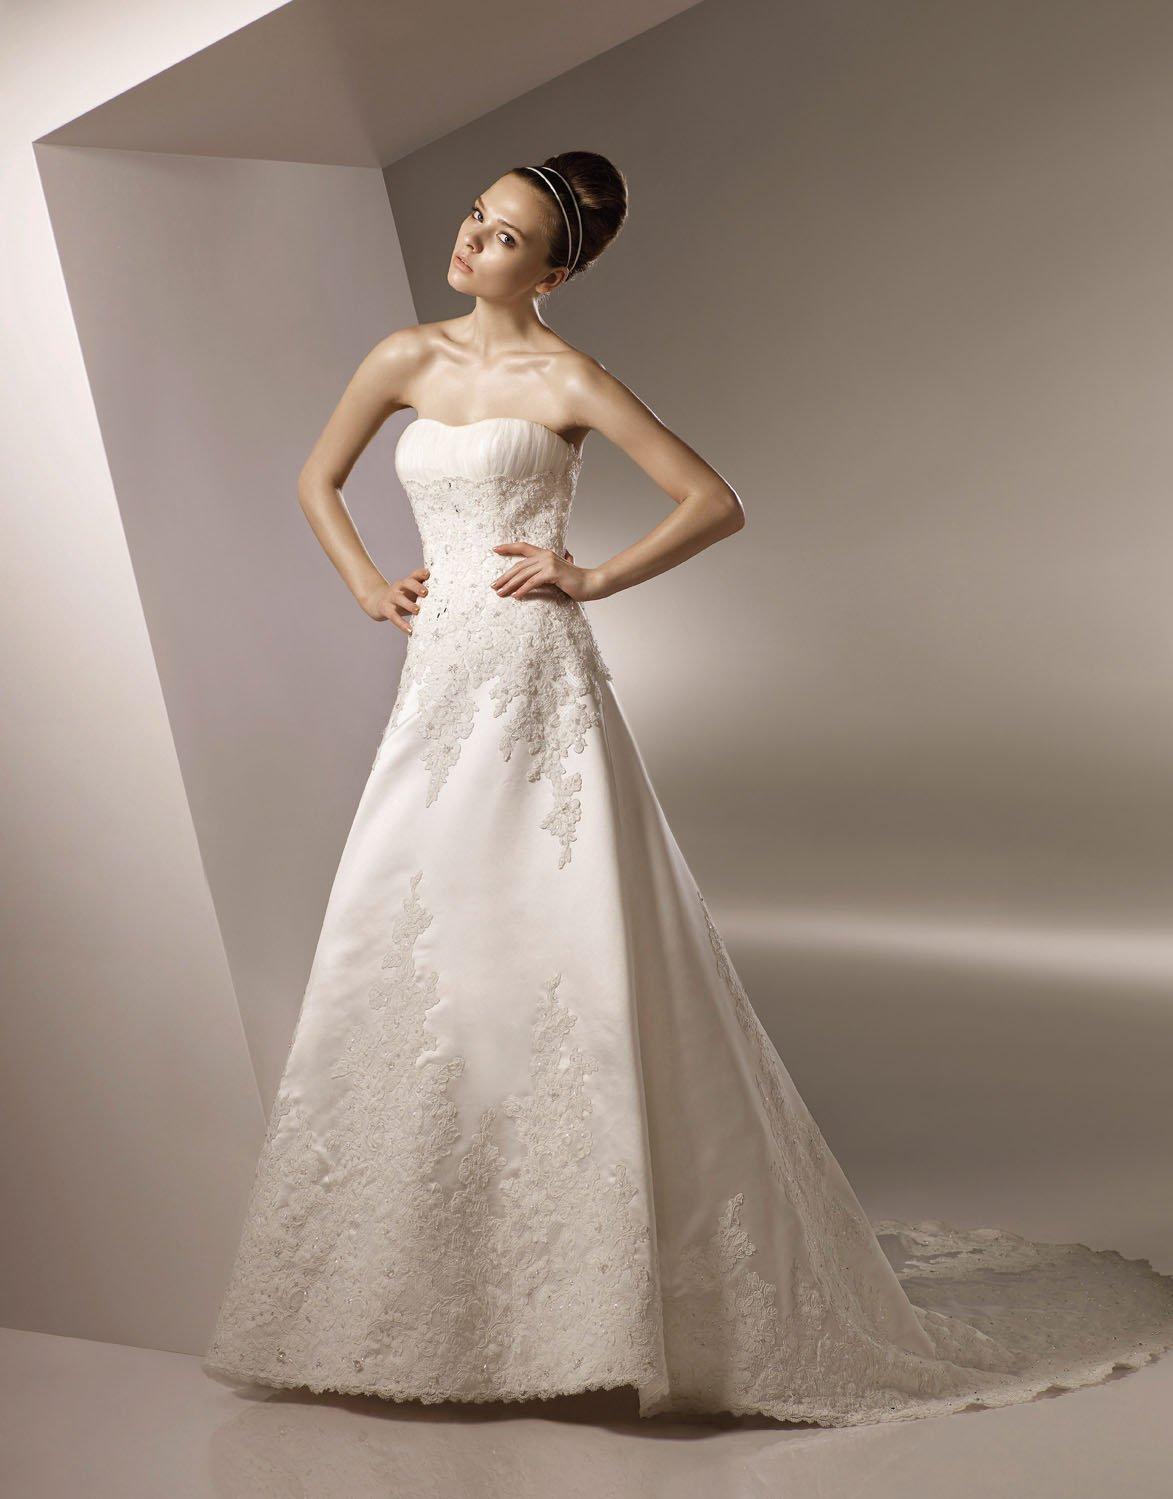 Scoop Neckline Appliqued Beading Wedding Dress Bridal Gown aq0029